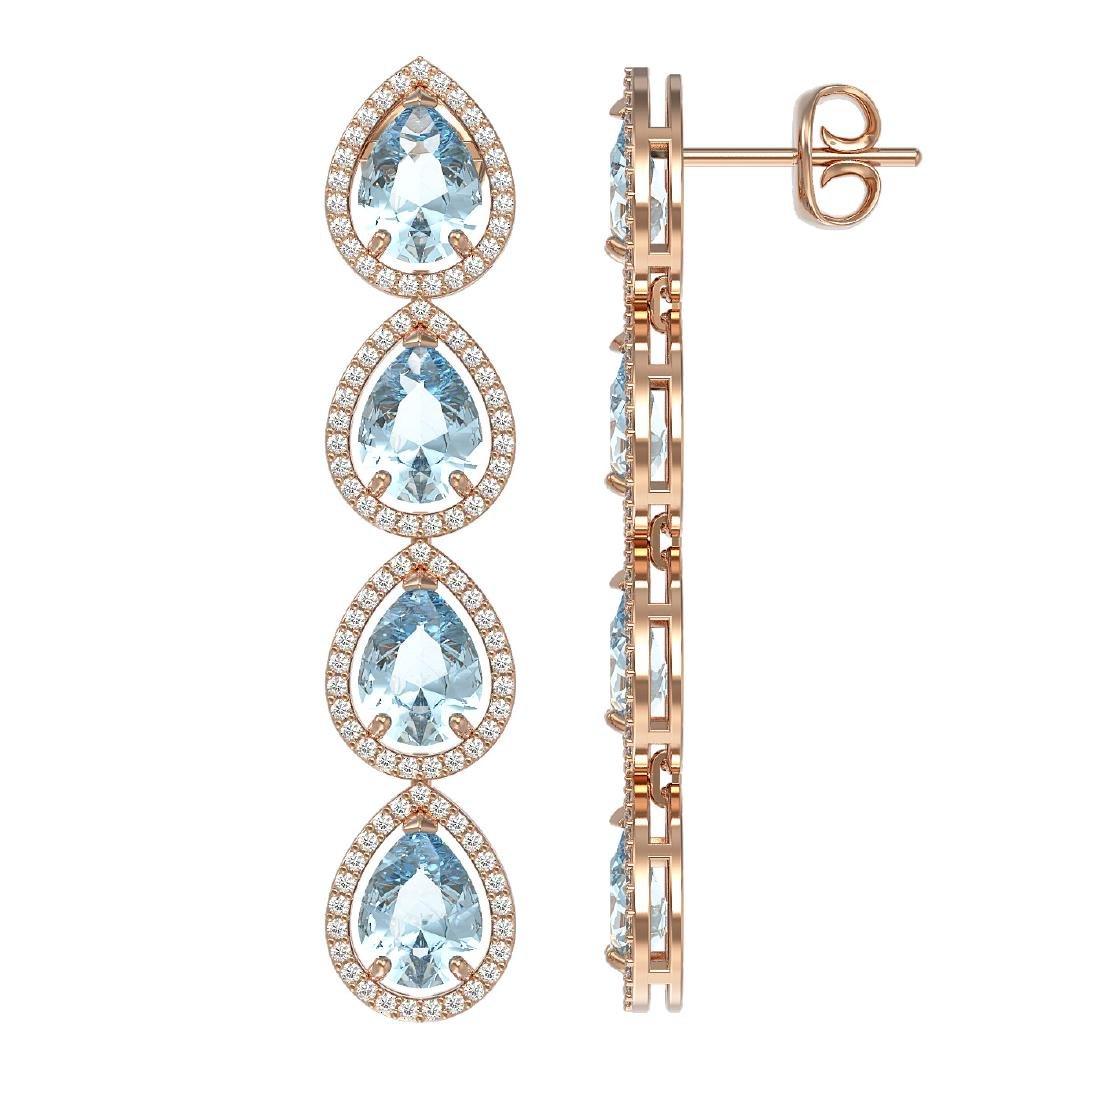 10.56 CTW Aquamarine & Diamond Halo Earrings 10K Rose - 2